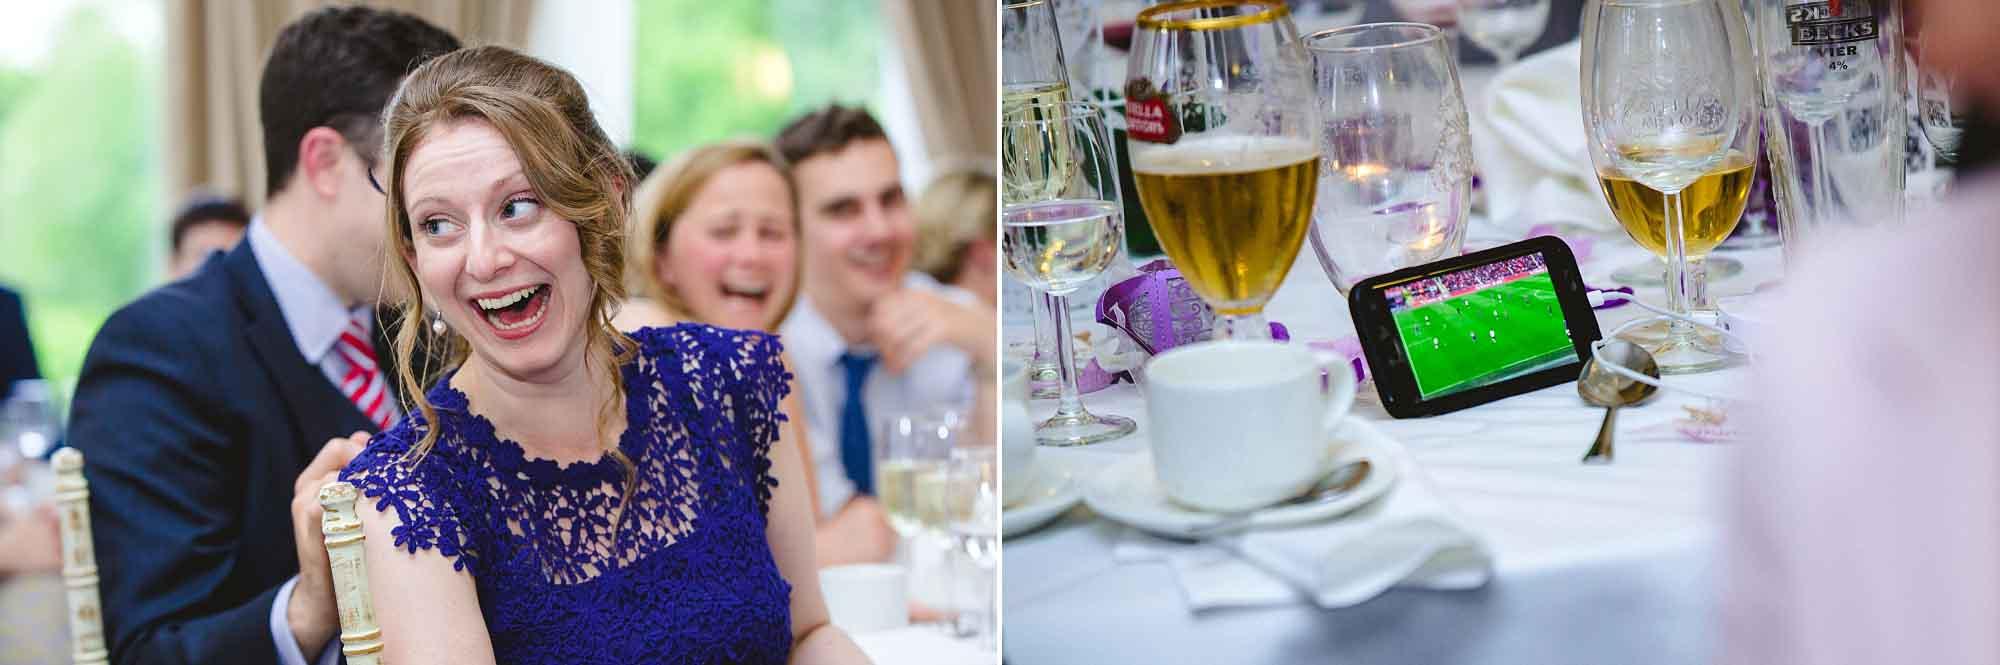 Ponsbourne-Park-Hotel-Wedding_0112.jpg